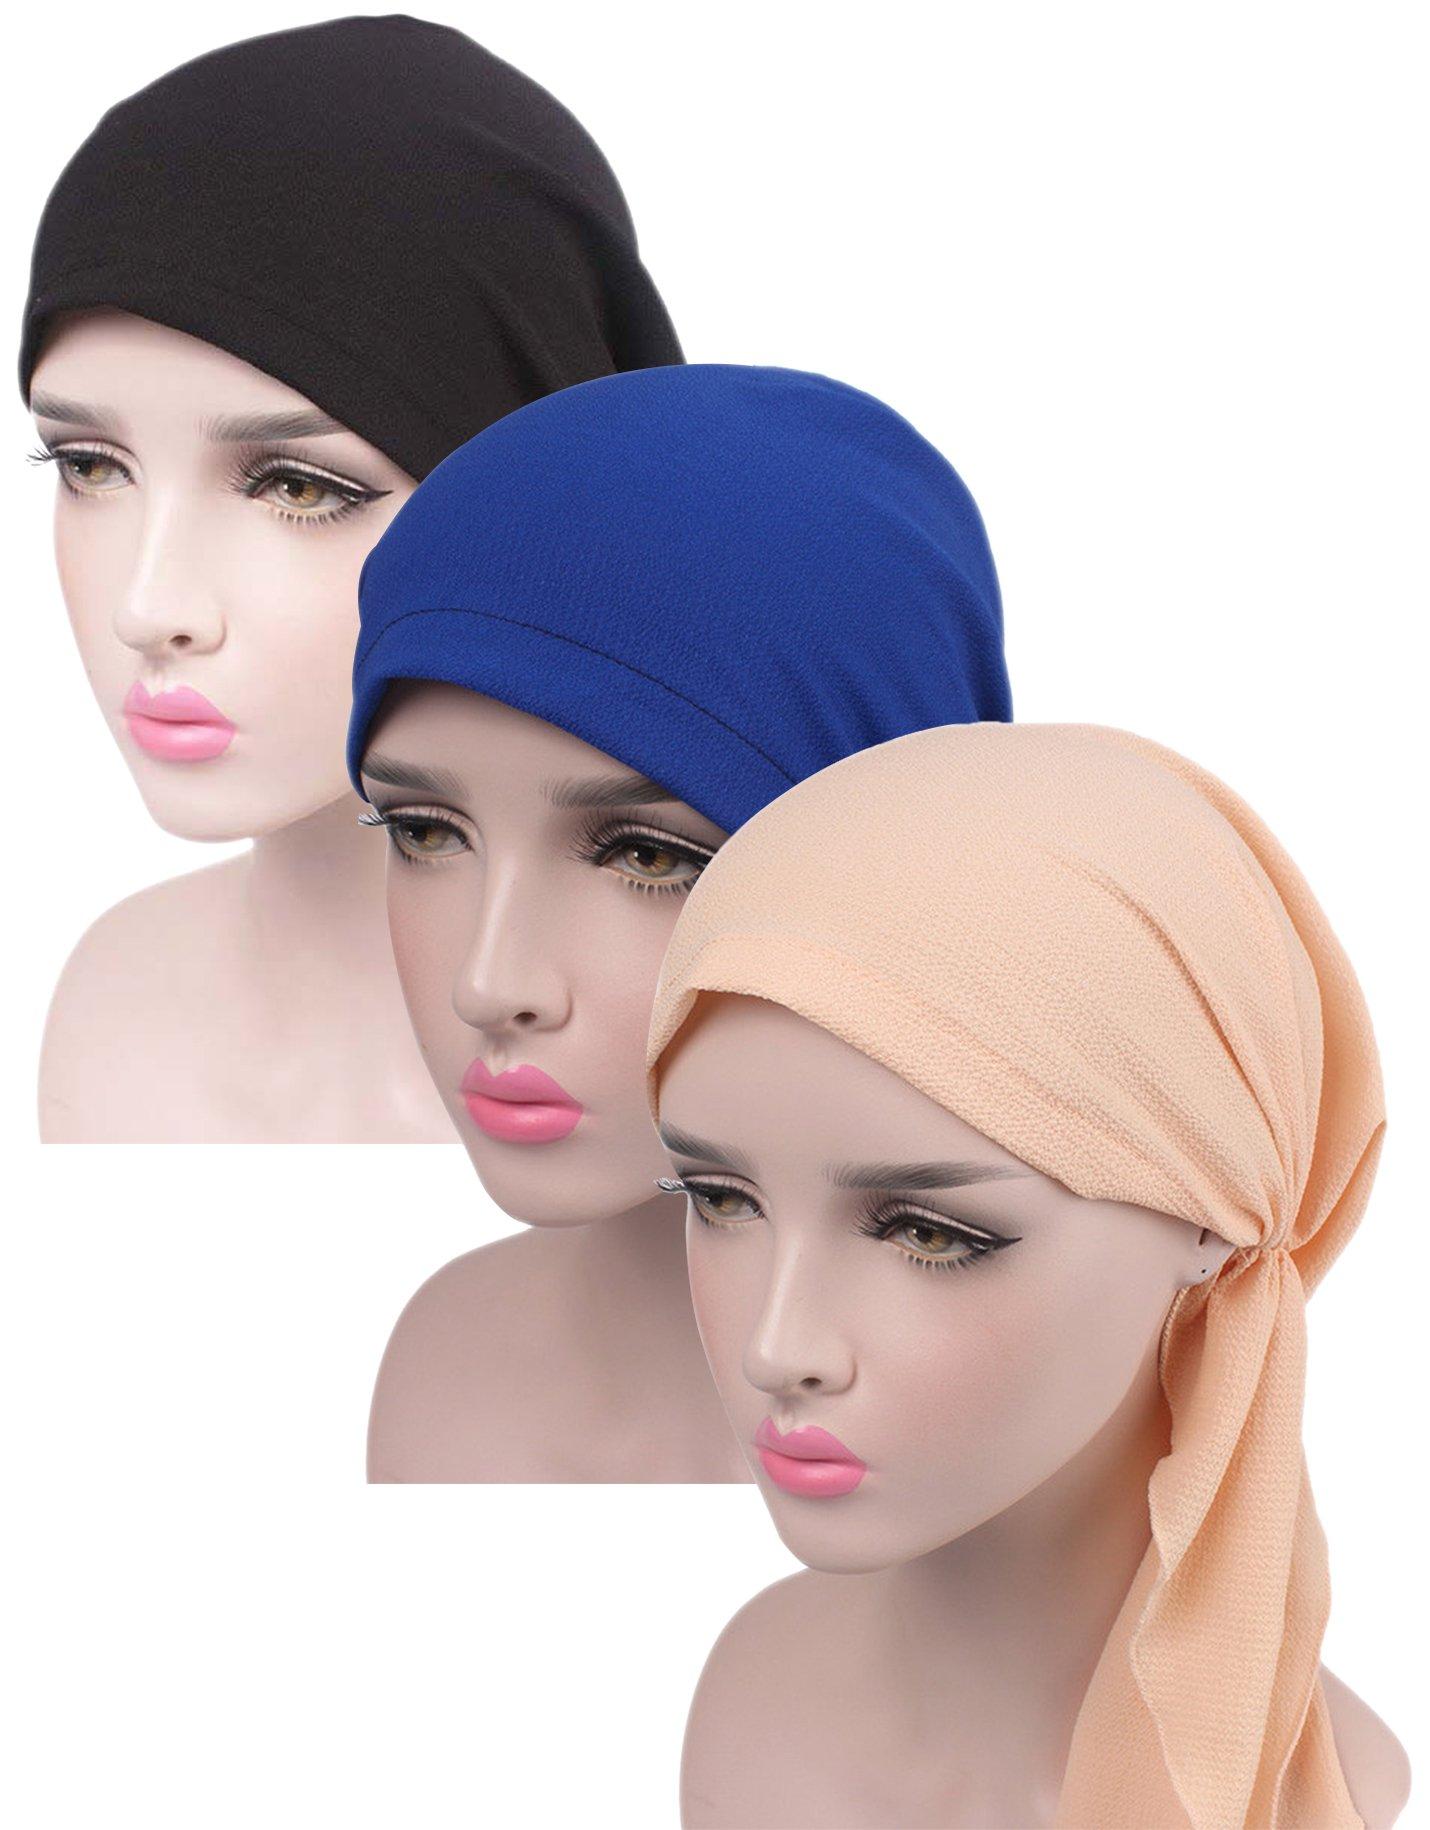 TFB.Love Chemo Hat Turban Head Scarves Pre-Tied Headwear (zuhe52) by TFB.Love (Image #1)